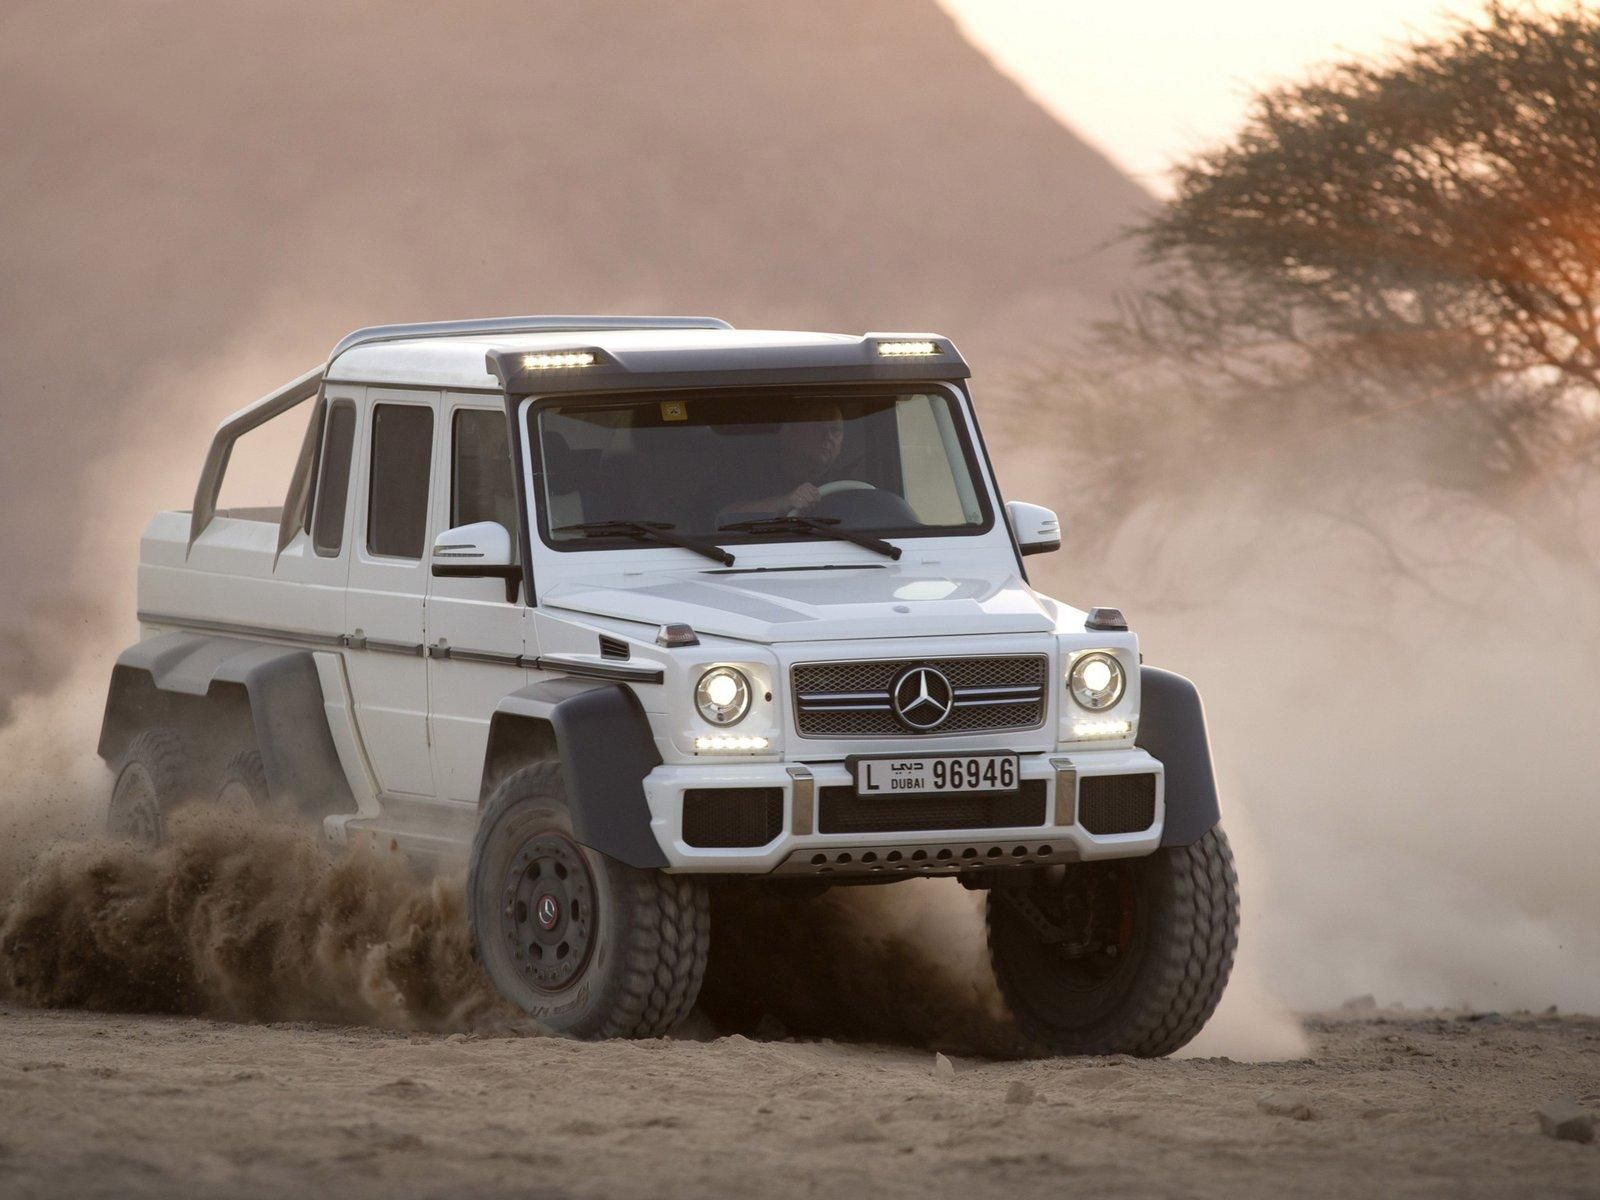 Mercedez Benz G63 AMG El verdadero mounstruo del desierto ¿Lobo